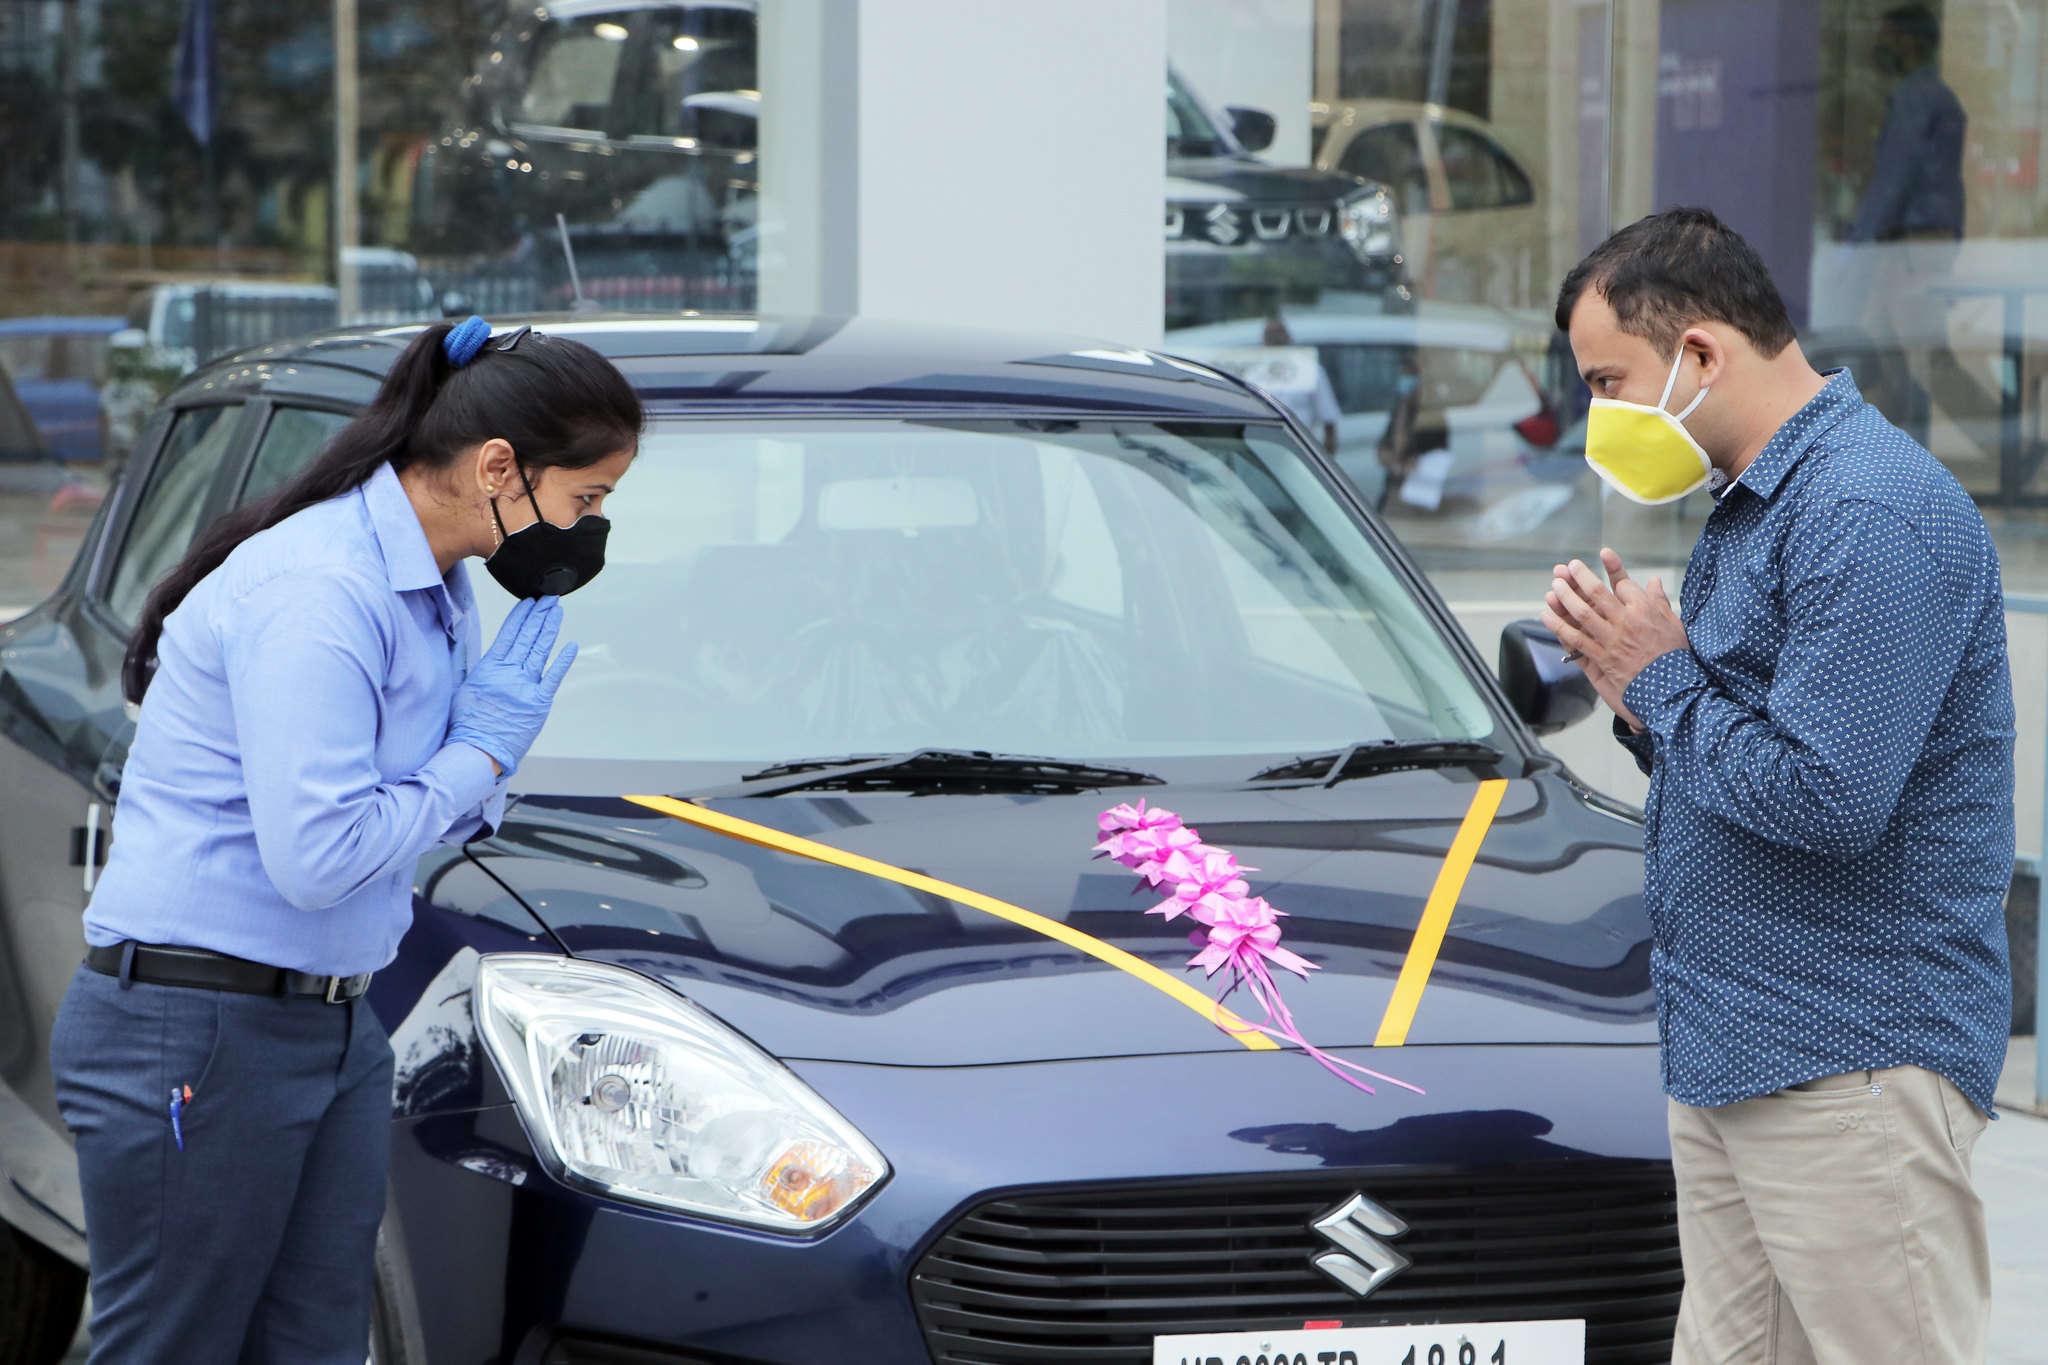 Maruti Suzuki car finance: Maruti Suzuki partners with Axis Bank for  finance solutions, Auto News, ET Auto